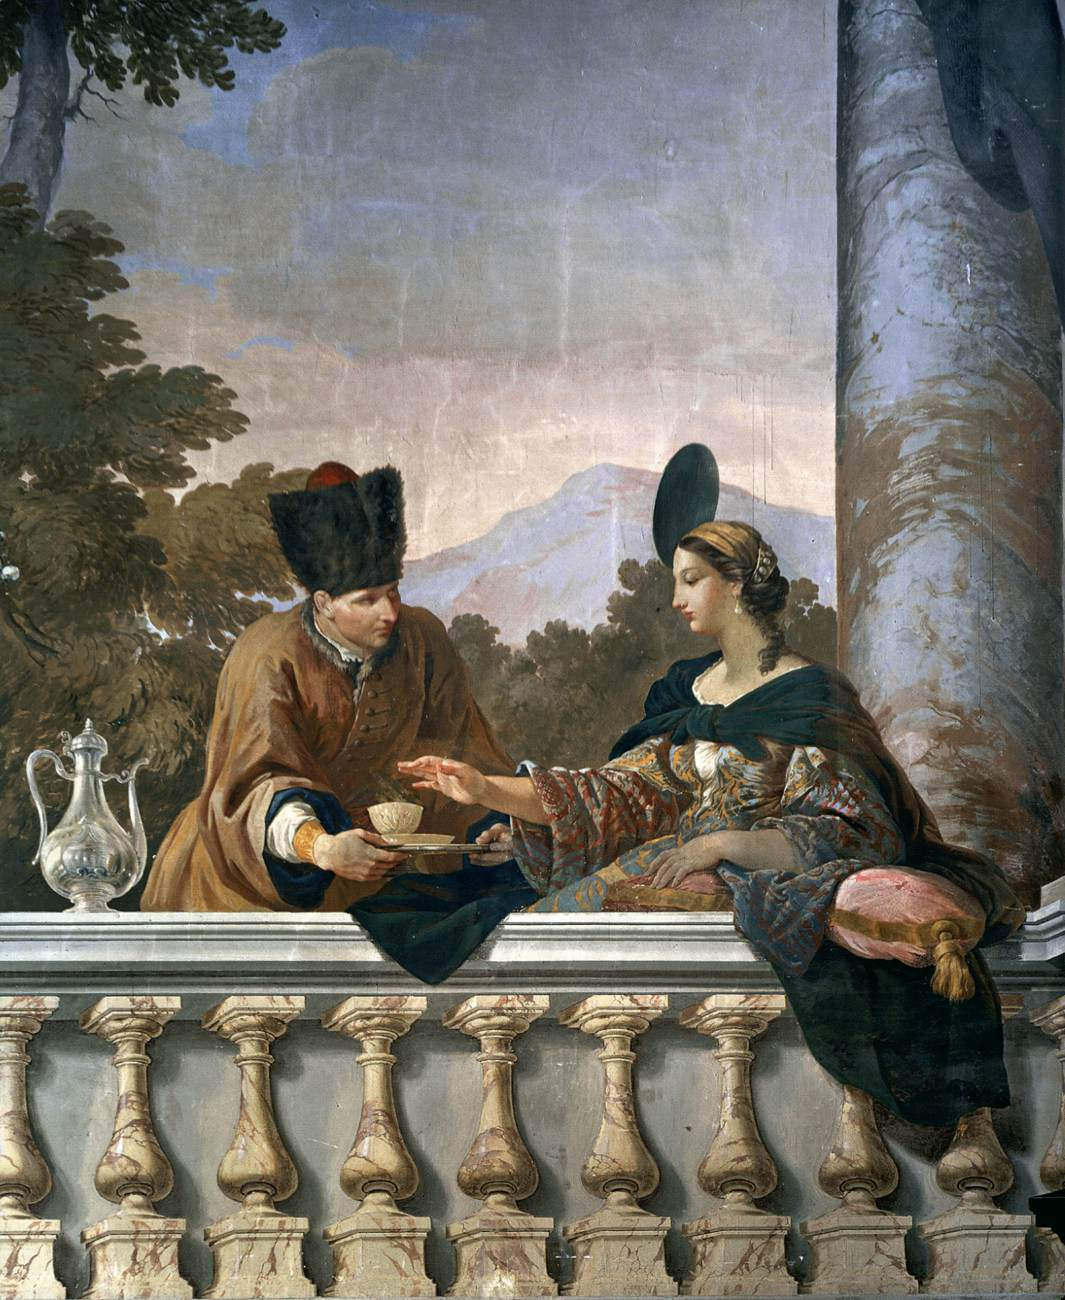 Stefano Pozzi (1699 Rome 1768), Wandversiering, 1758, Fresco, Palazzo Colonna, Rome